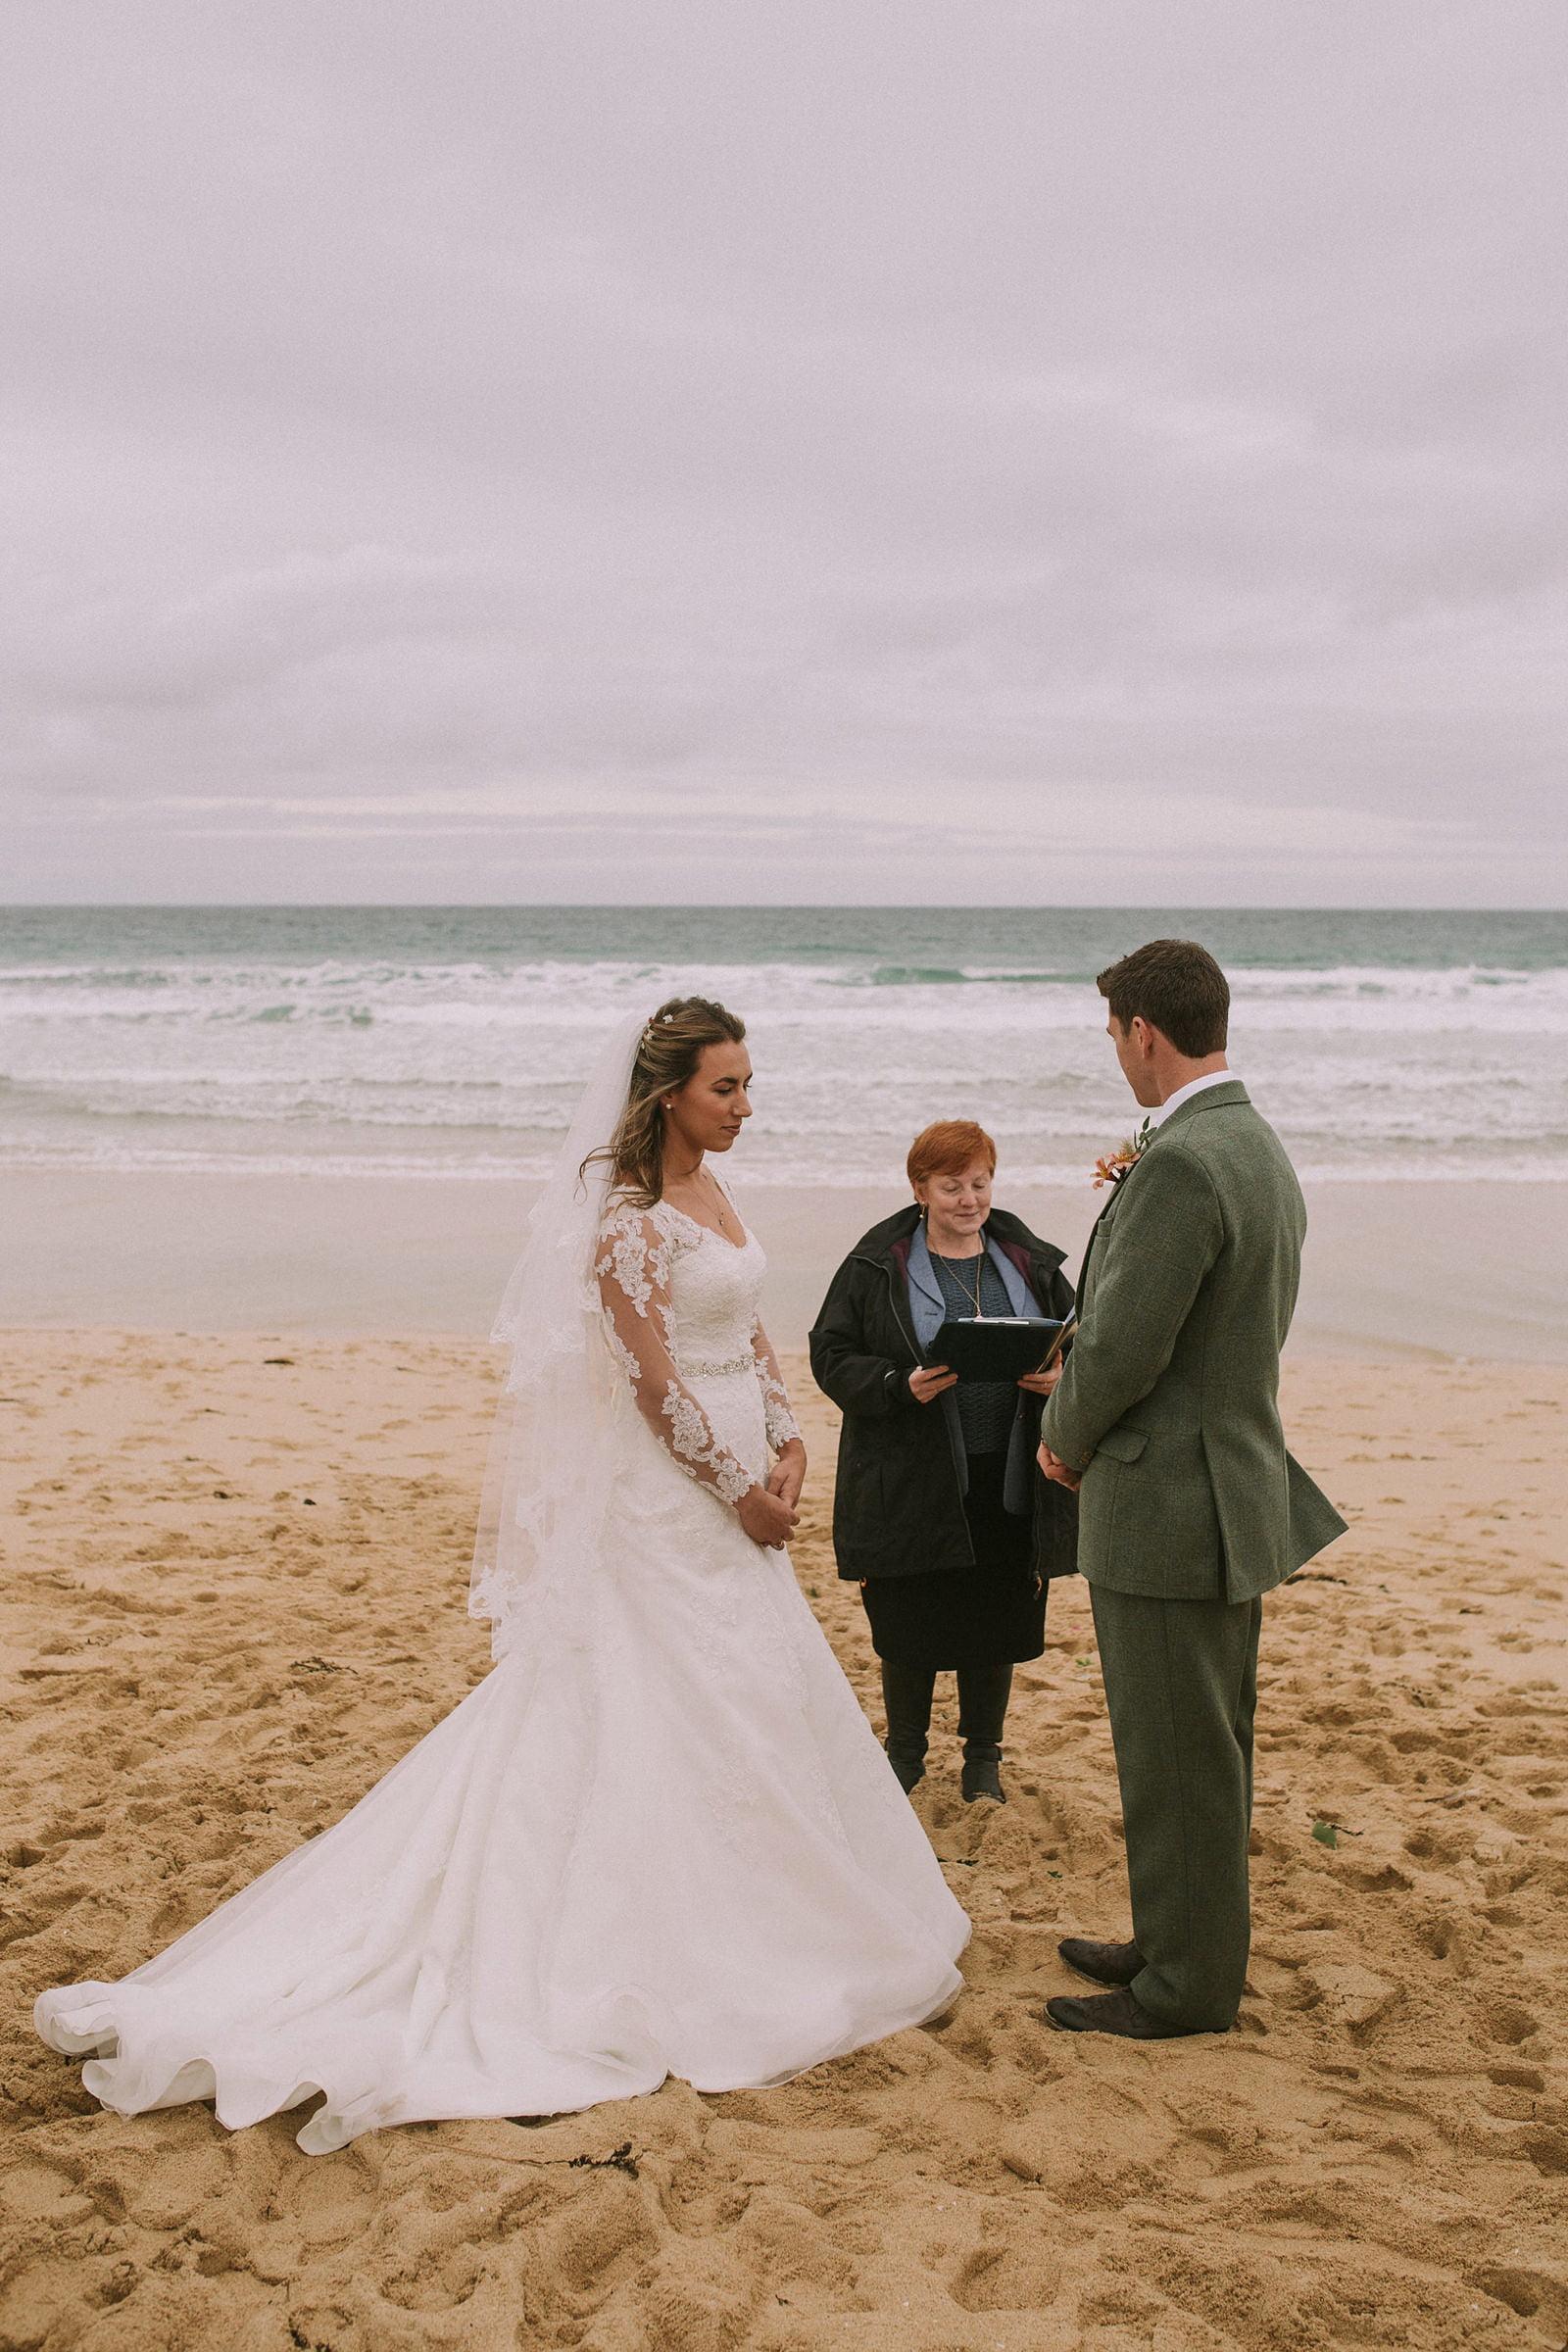 fine art wedding photographer isle of harris